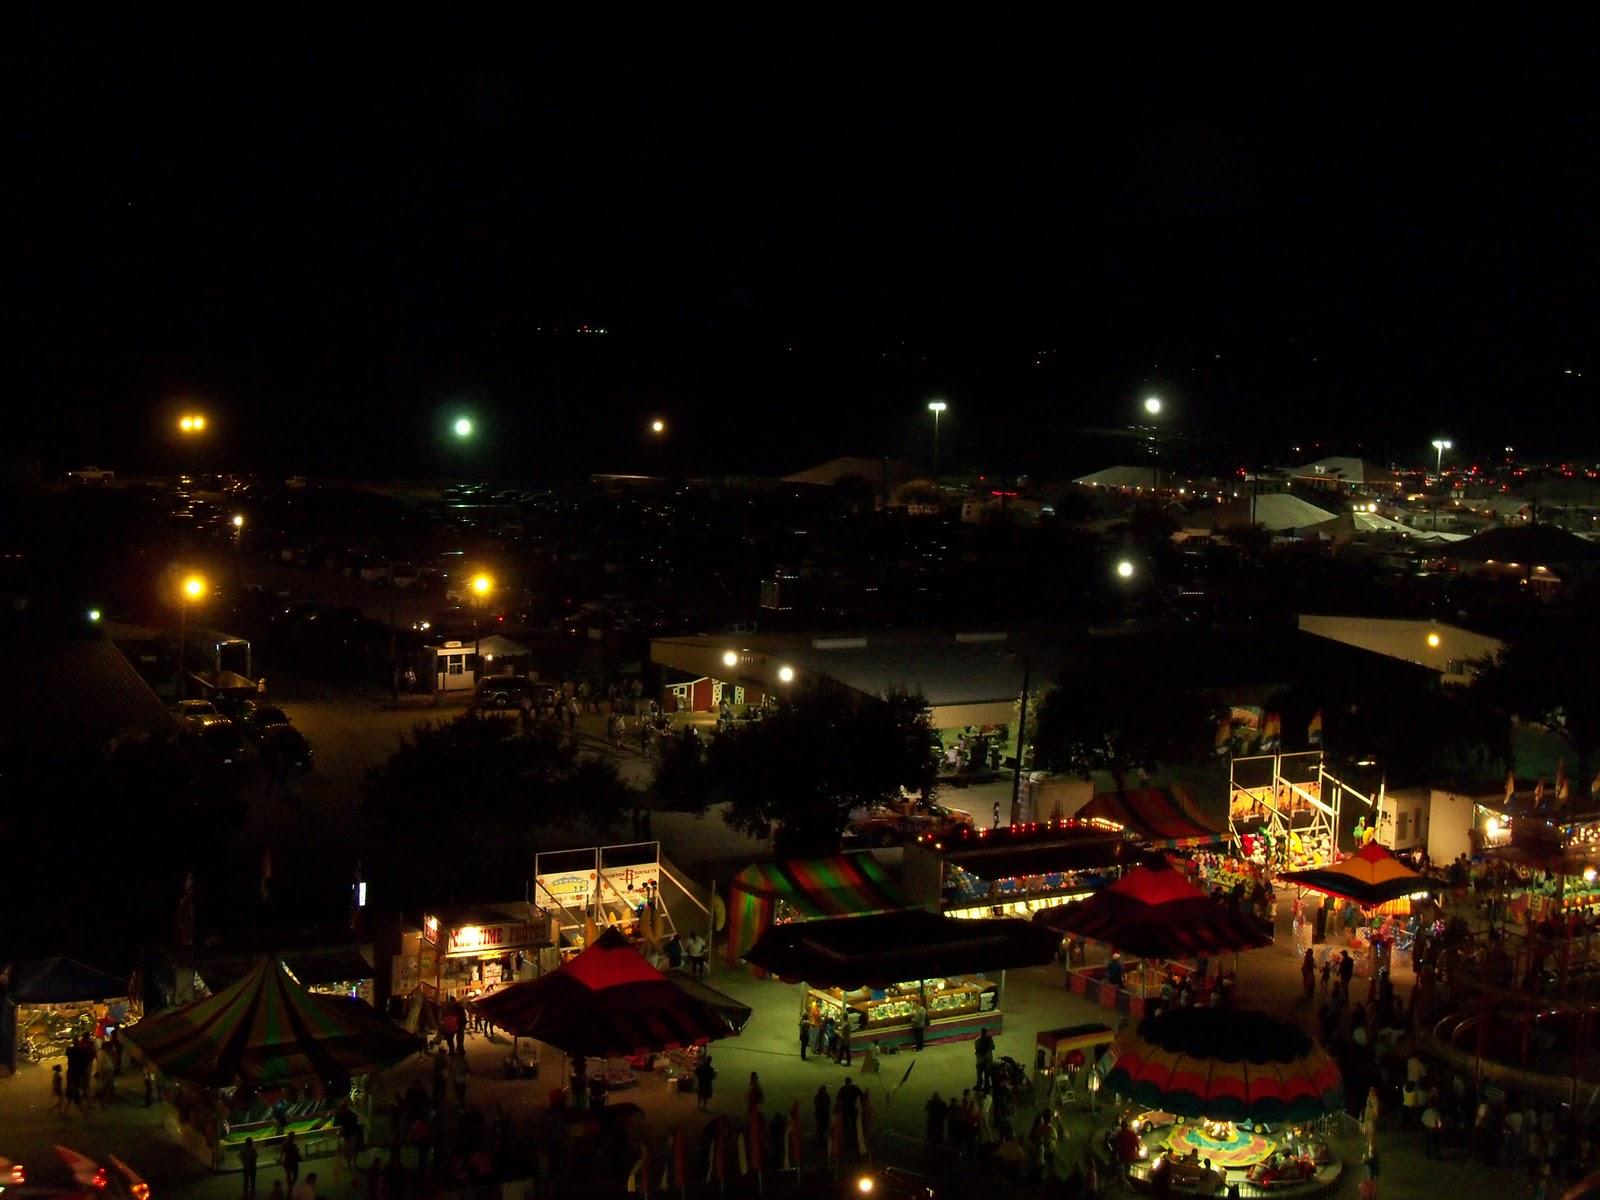 Fort Bend County Fair 2010 - 101_6061.JPG